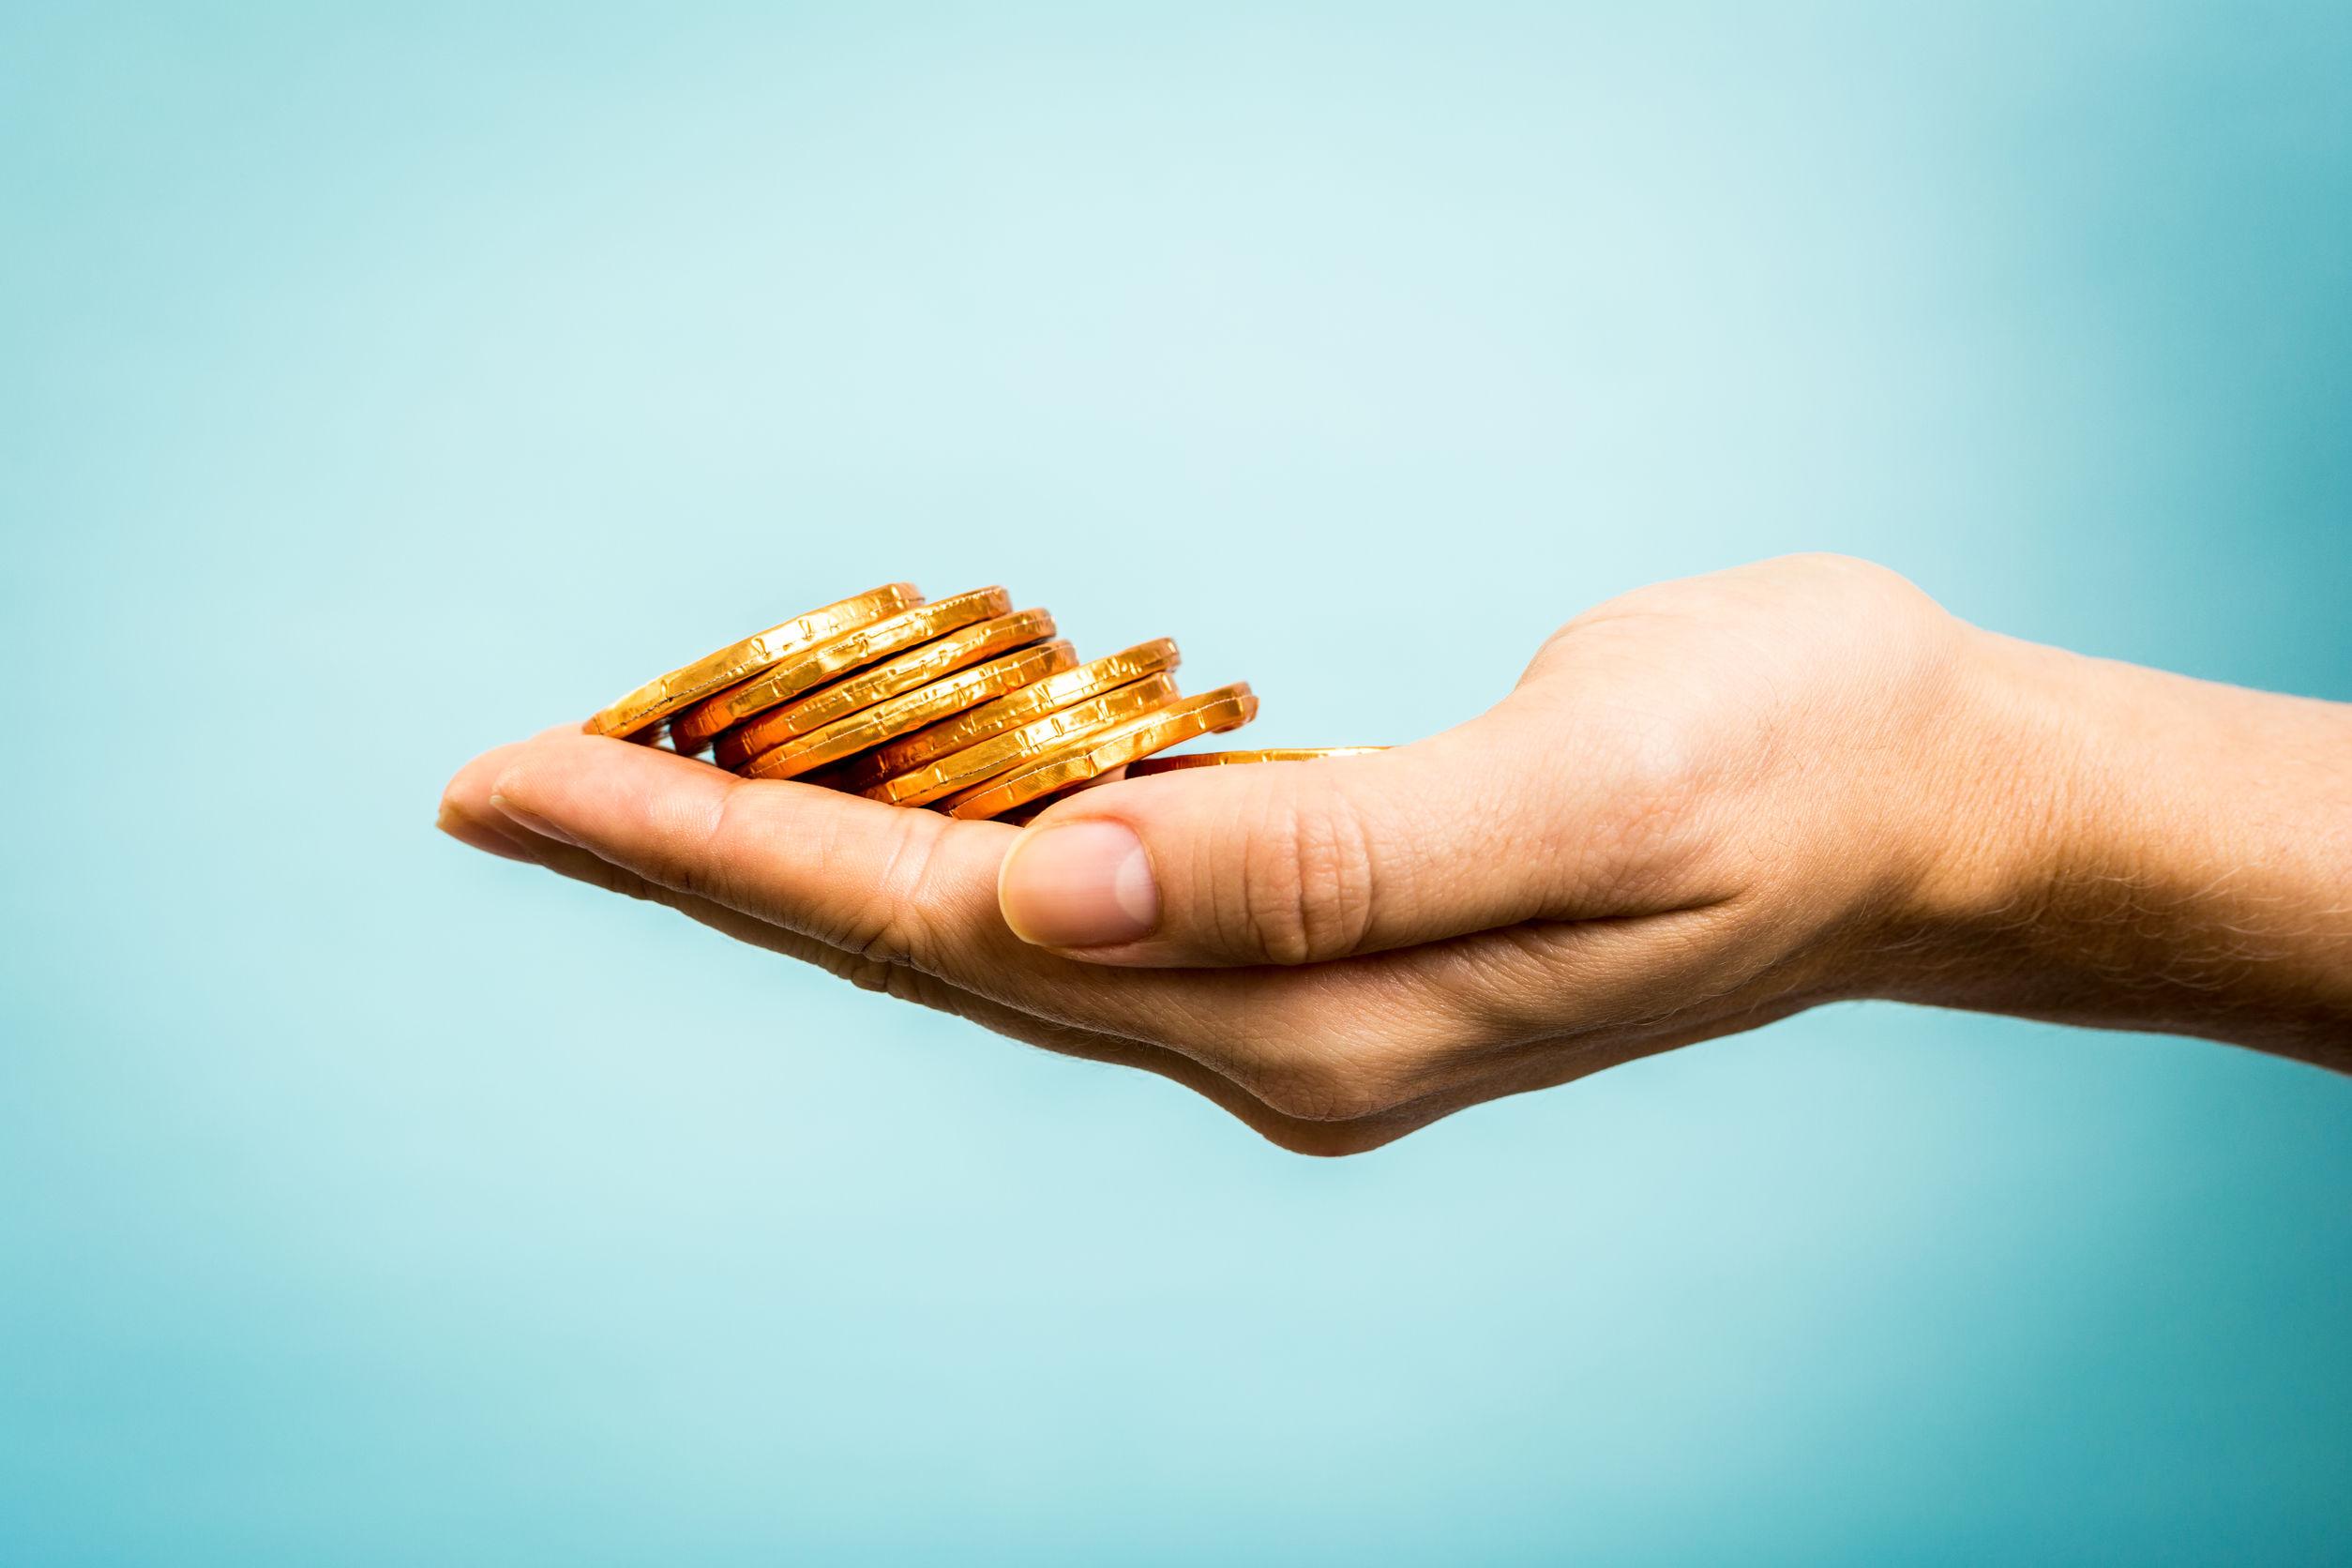 Hand holding golden coins